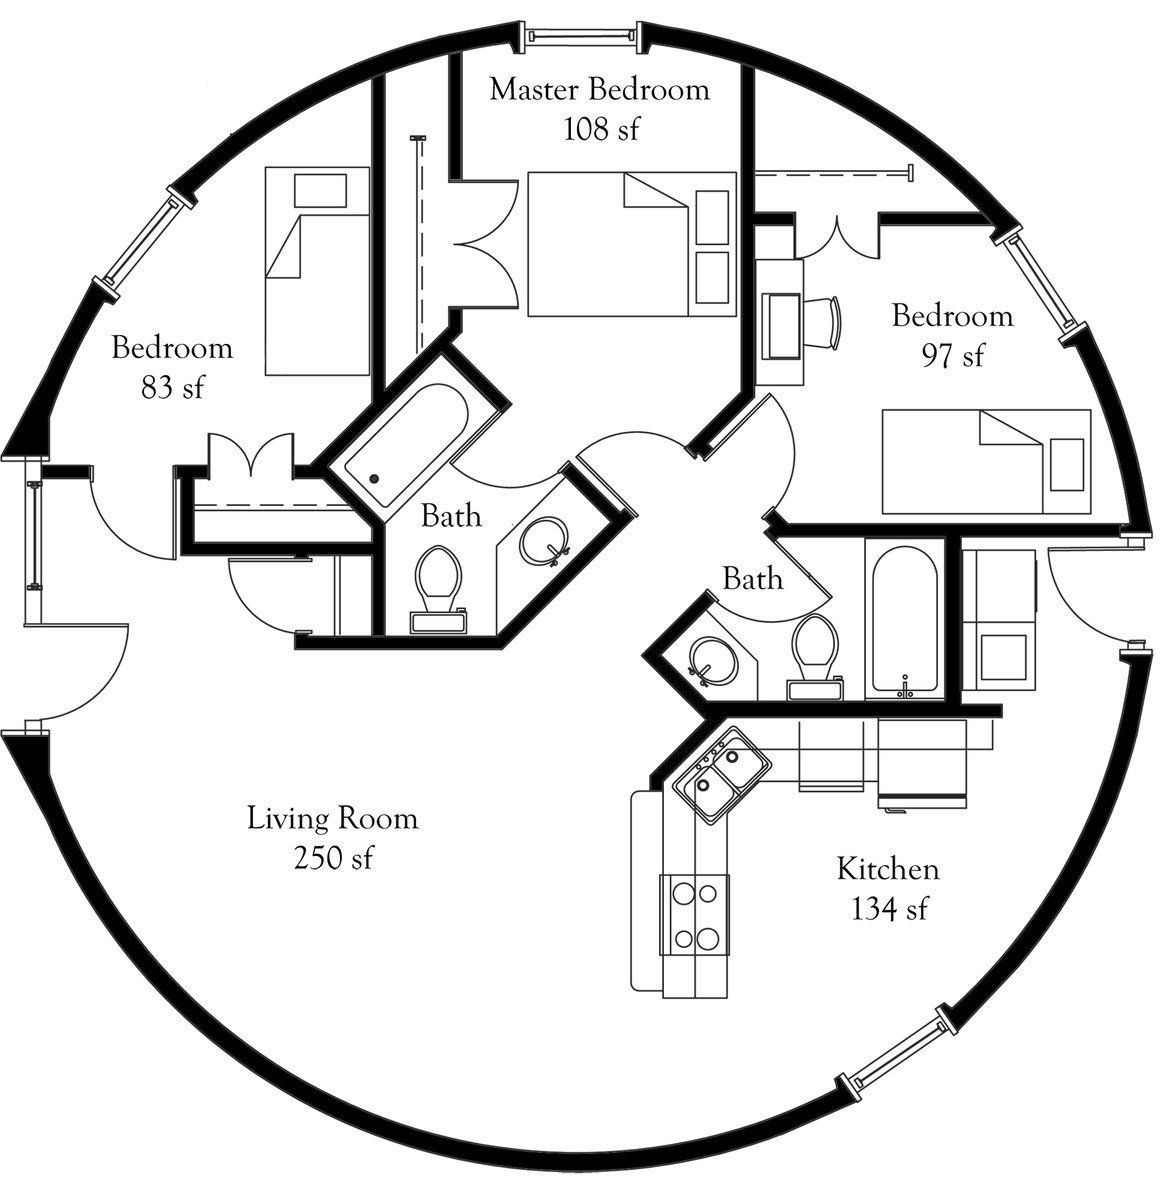 Best Kitchen Gallery: Plan Number Dl3601 Floor Area 1 017 Square Feet Diameter 36' 3 of Circular Room Home Plan on rachelxblog.com